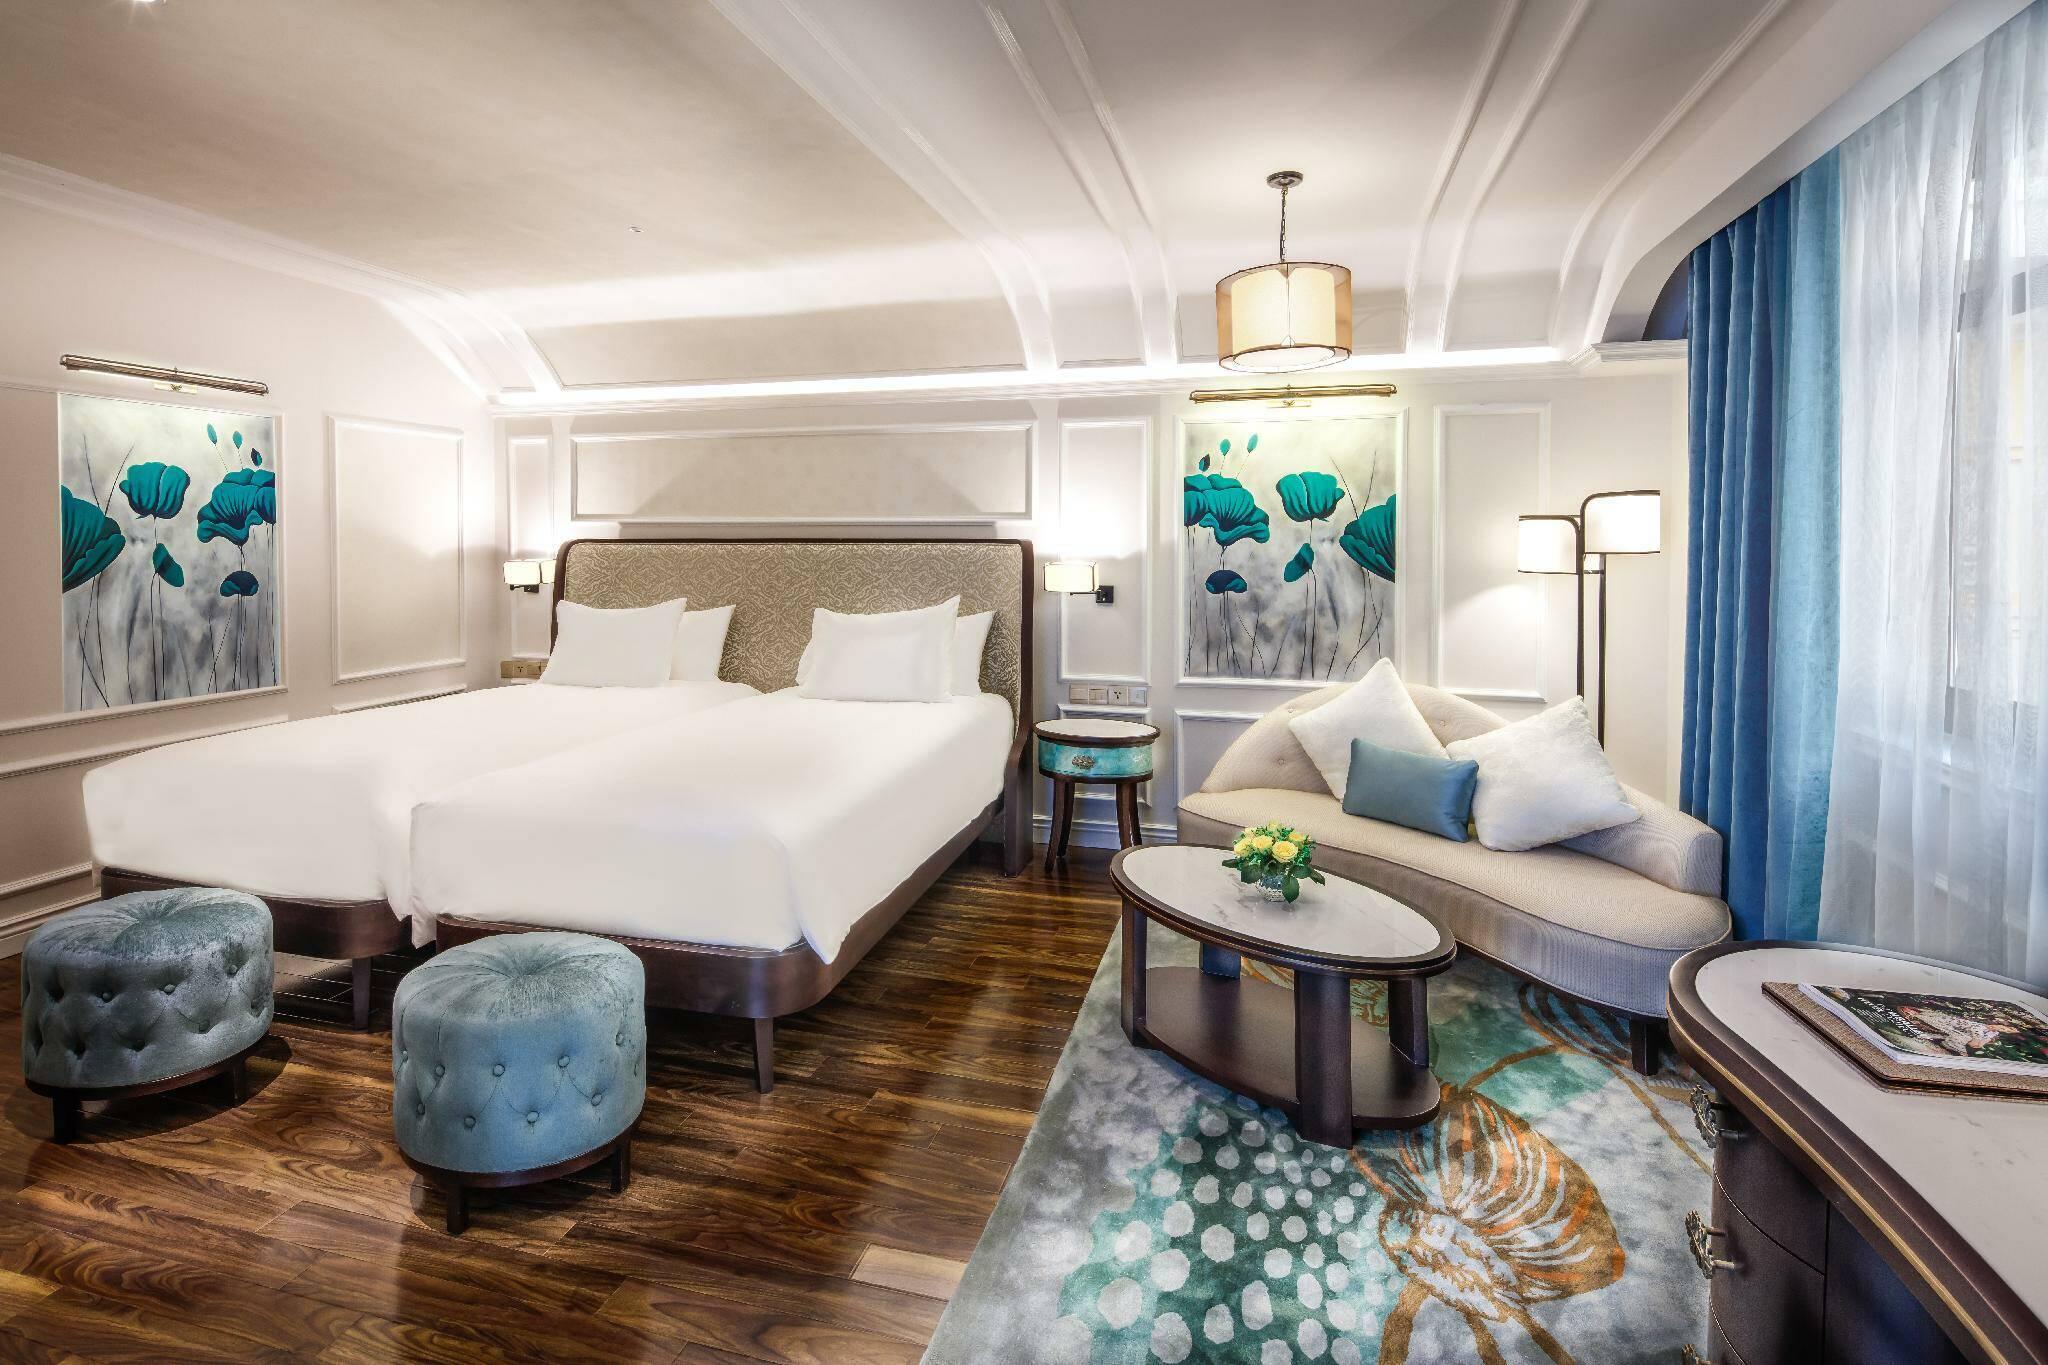 Vietnam Hotel Royal Chambre Hoi An